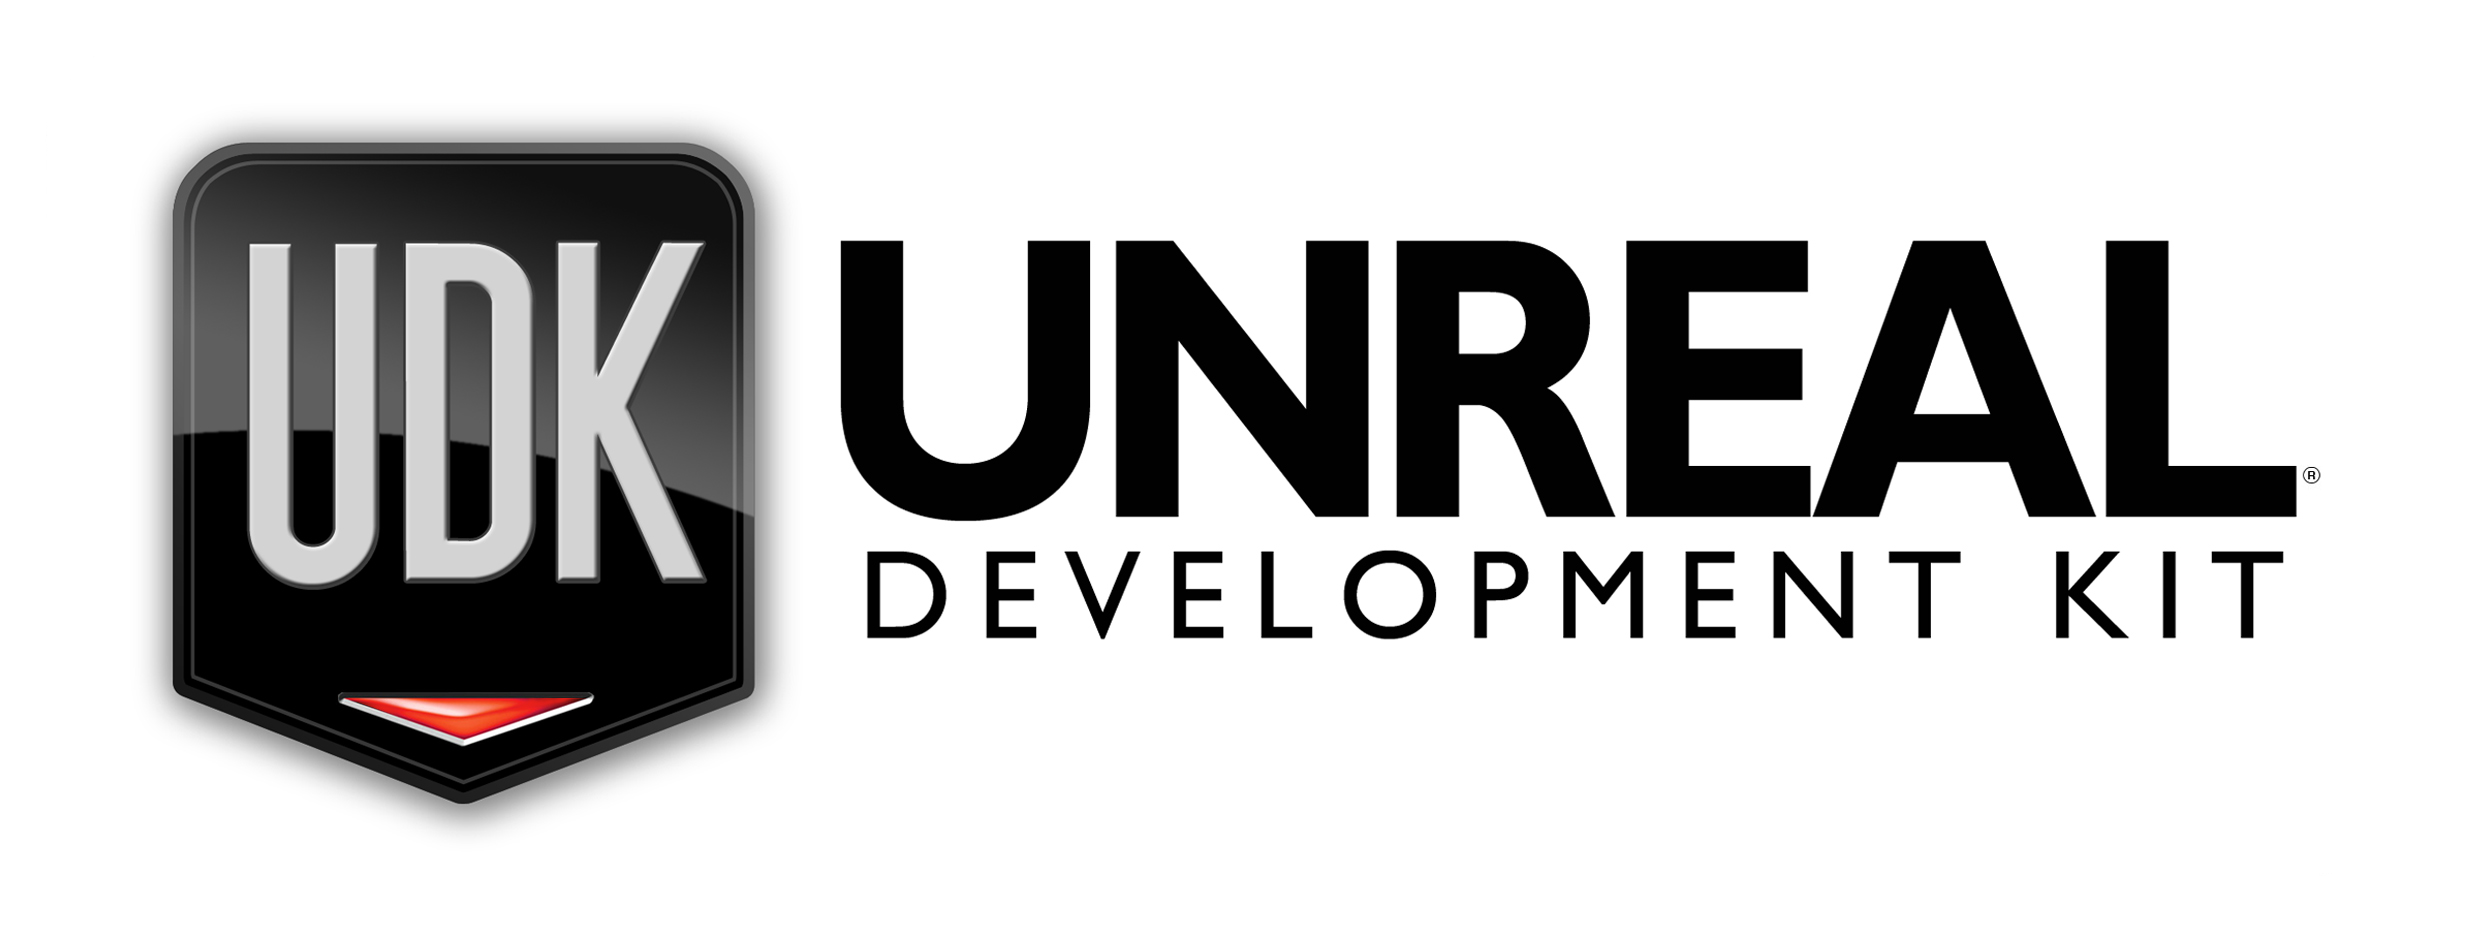 Unreal Development Kit image - danacowley - Mod DB